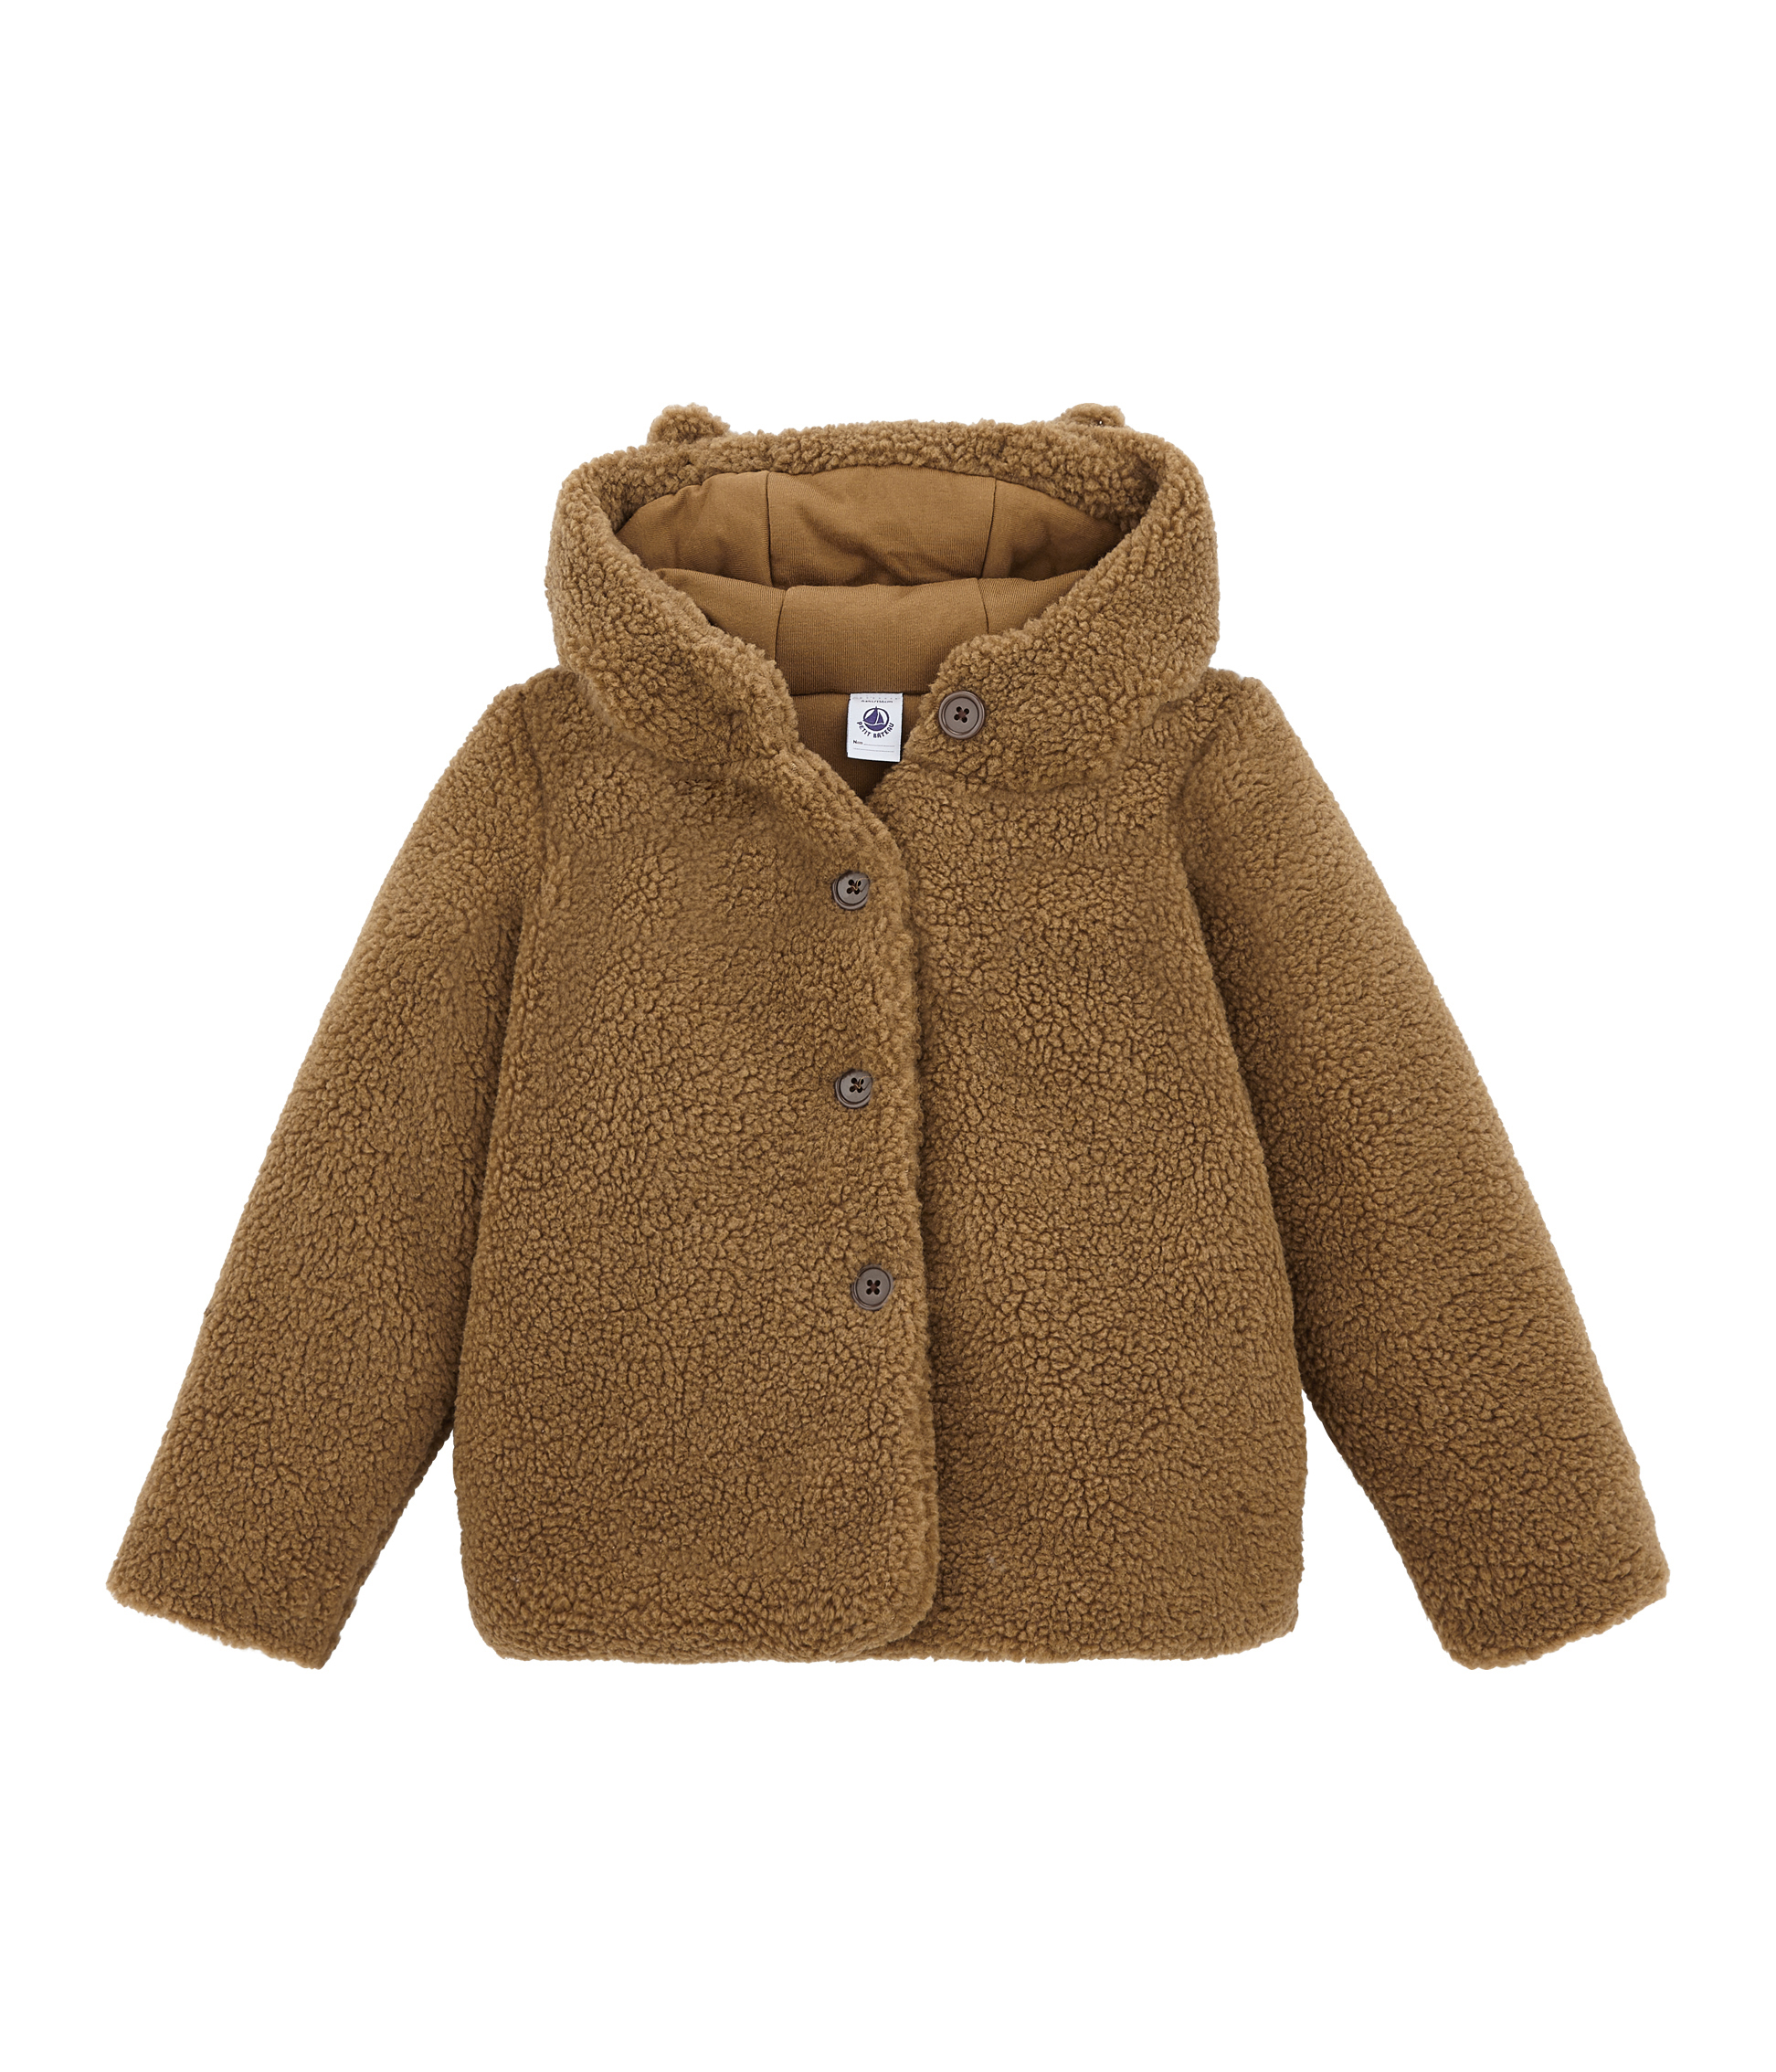 d008fd14c1bfd Manteau enfant fille en sherpa